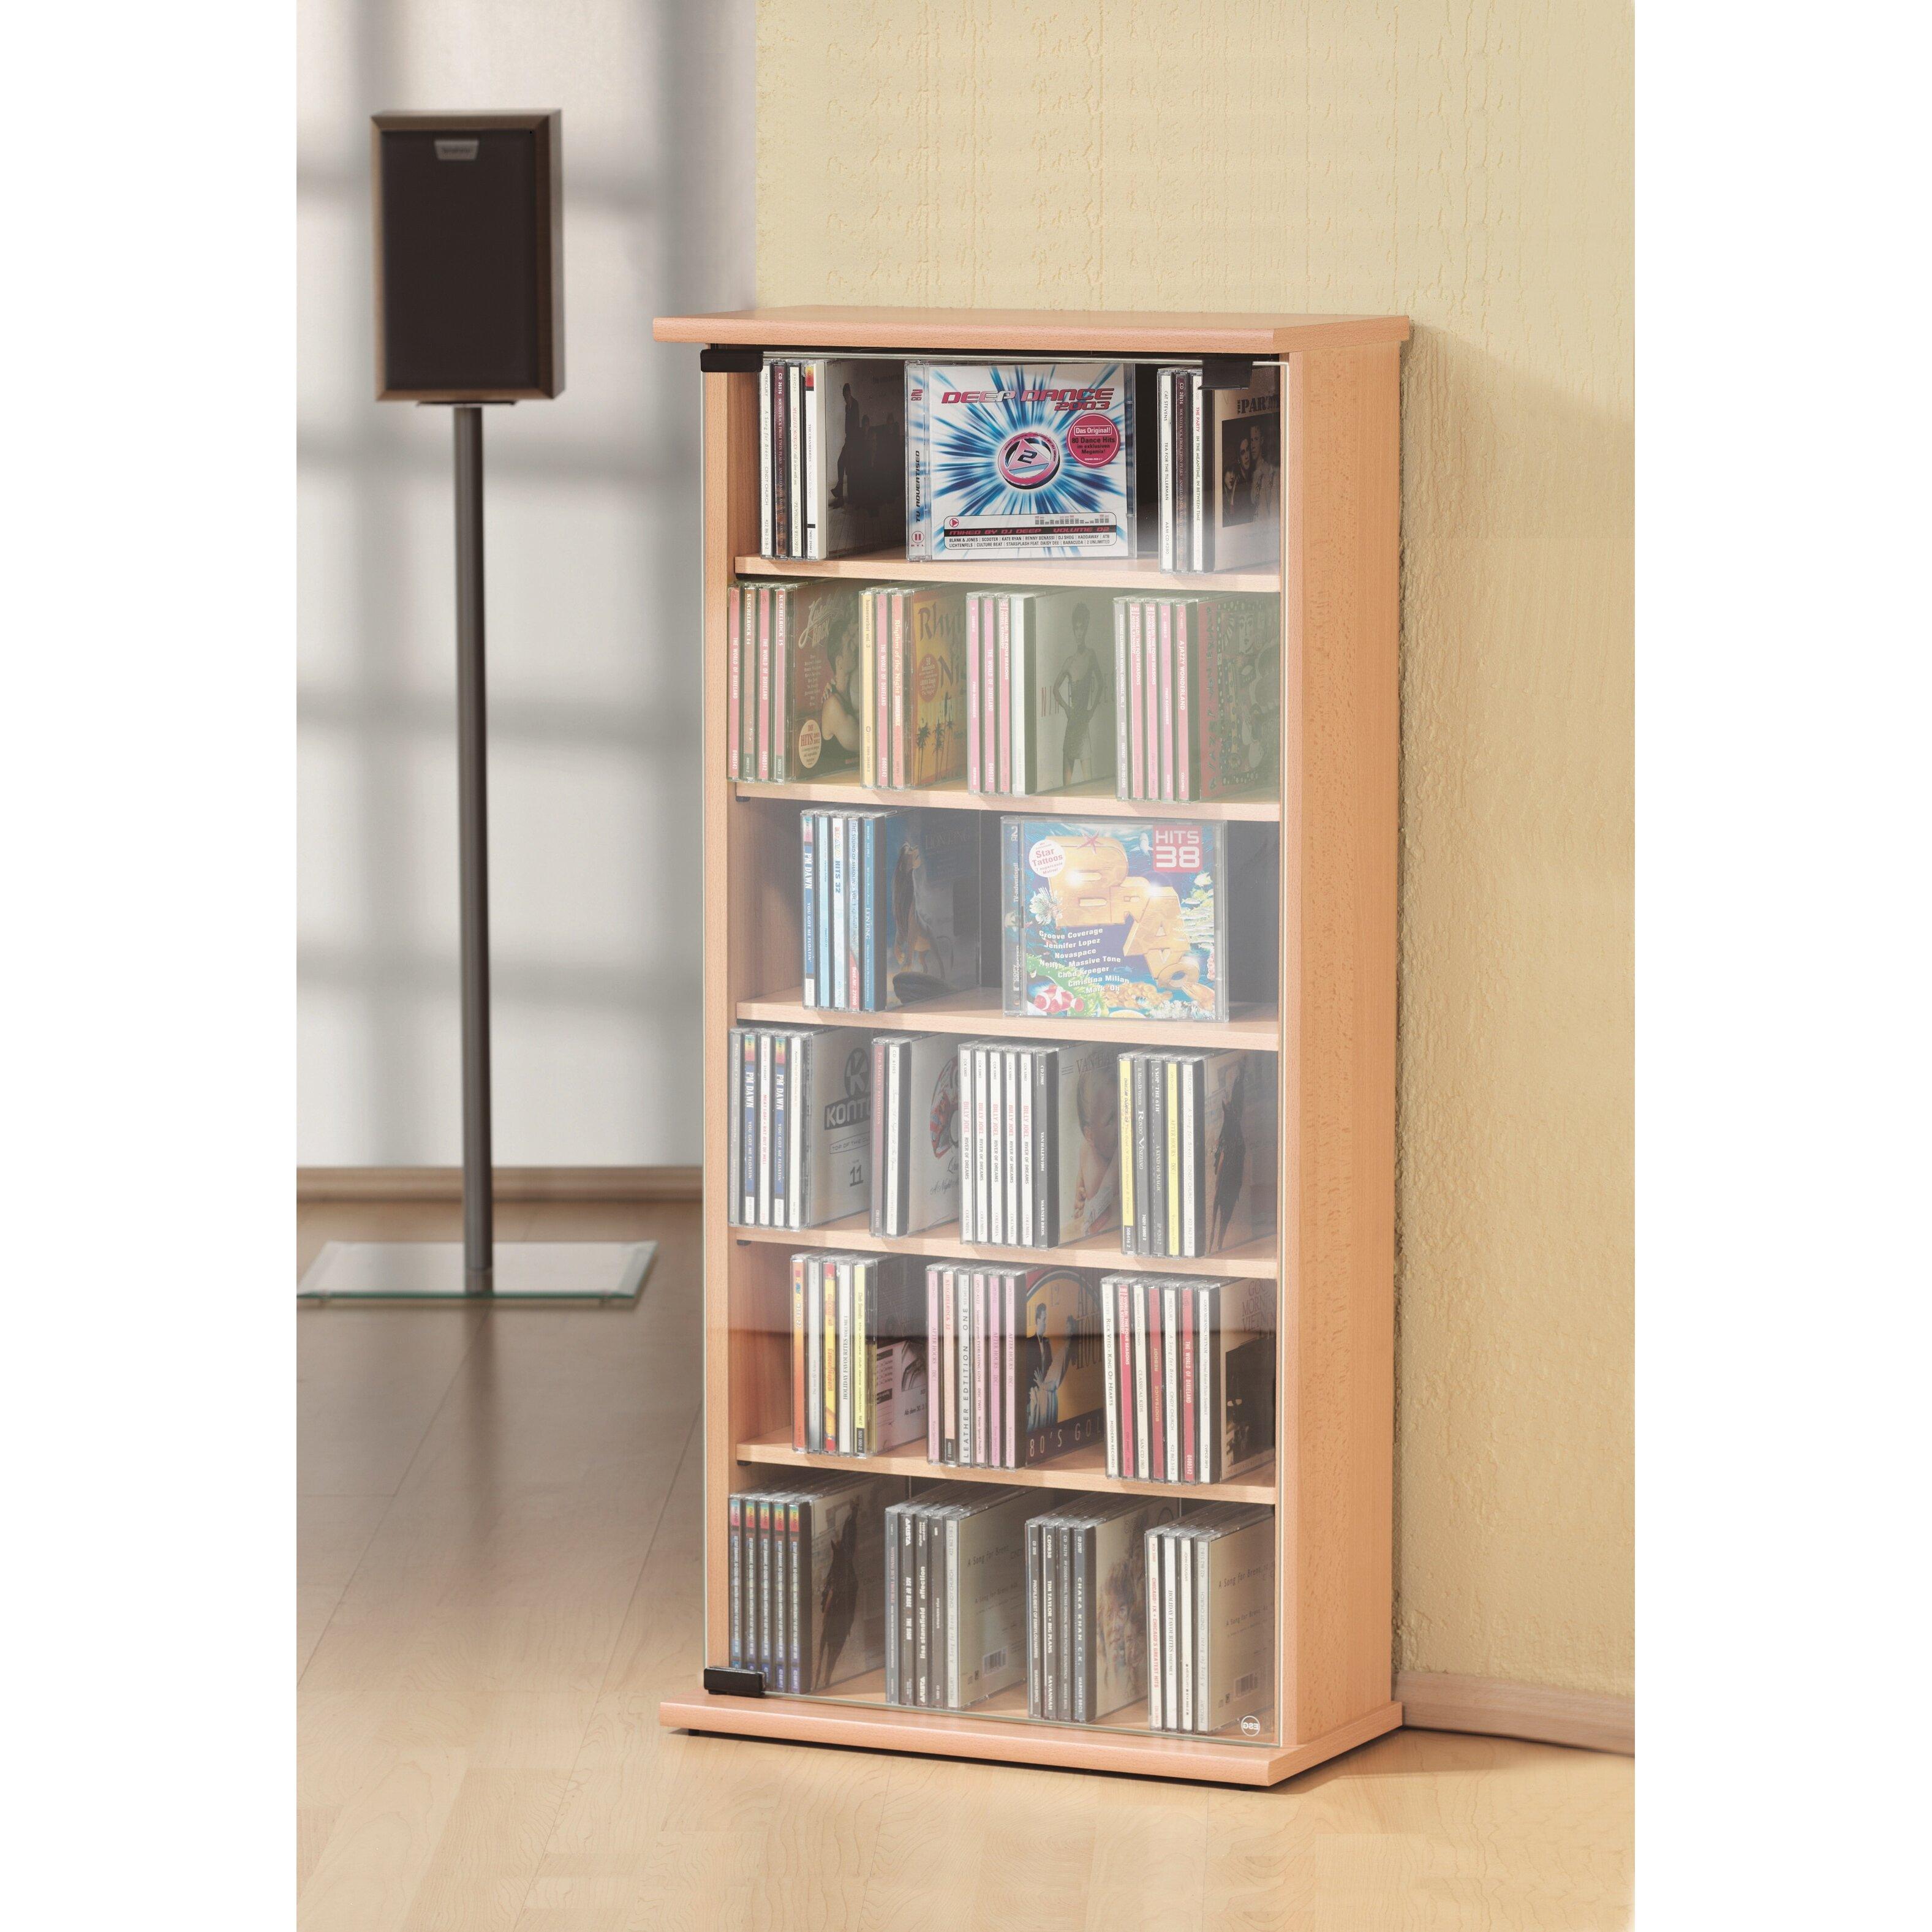 vcm vetro cd and dvd shelf reviews wayfair uk. Black Bedroom Furniture Sets. Home Design Ideas